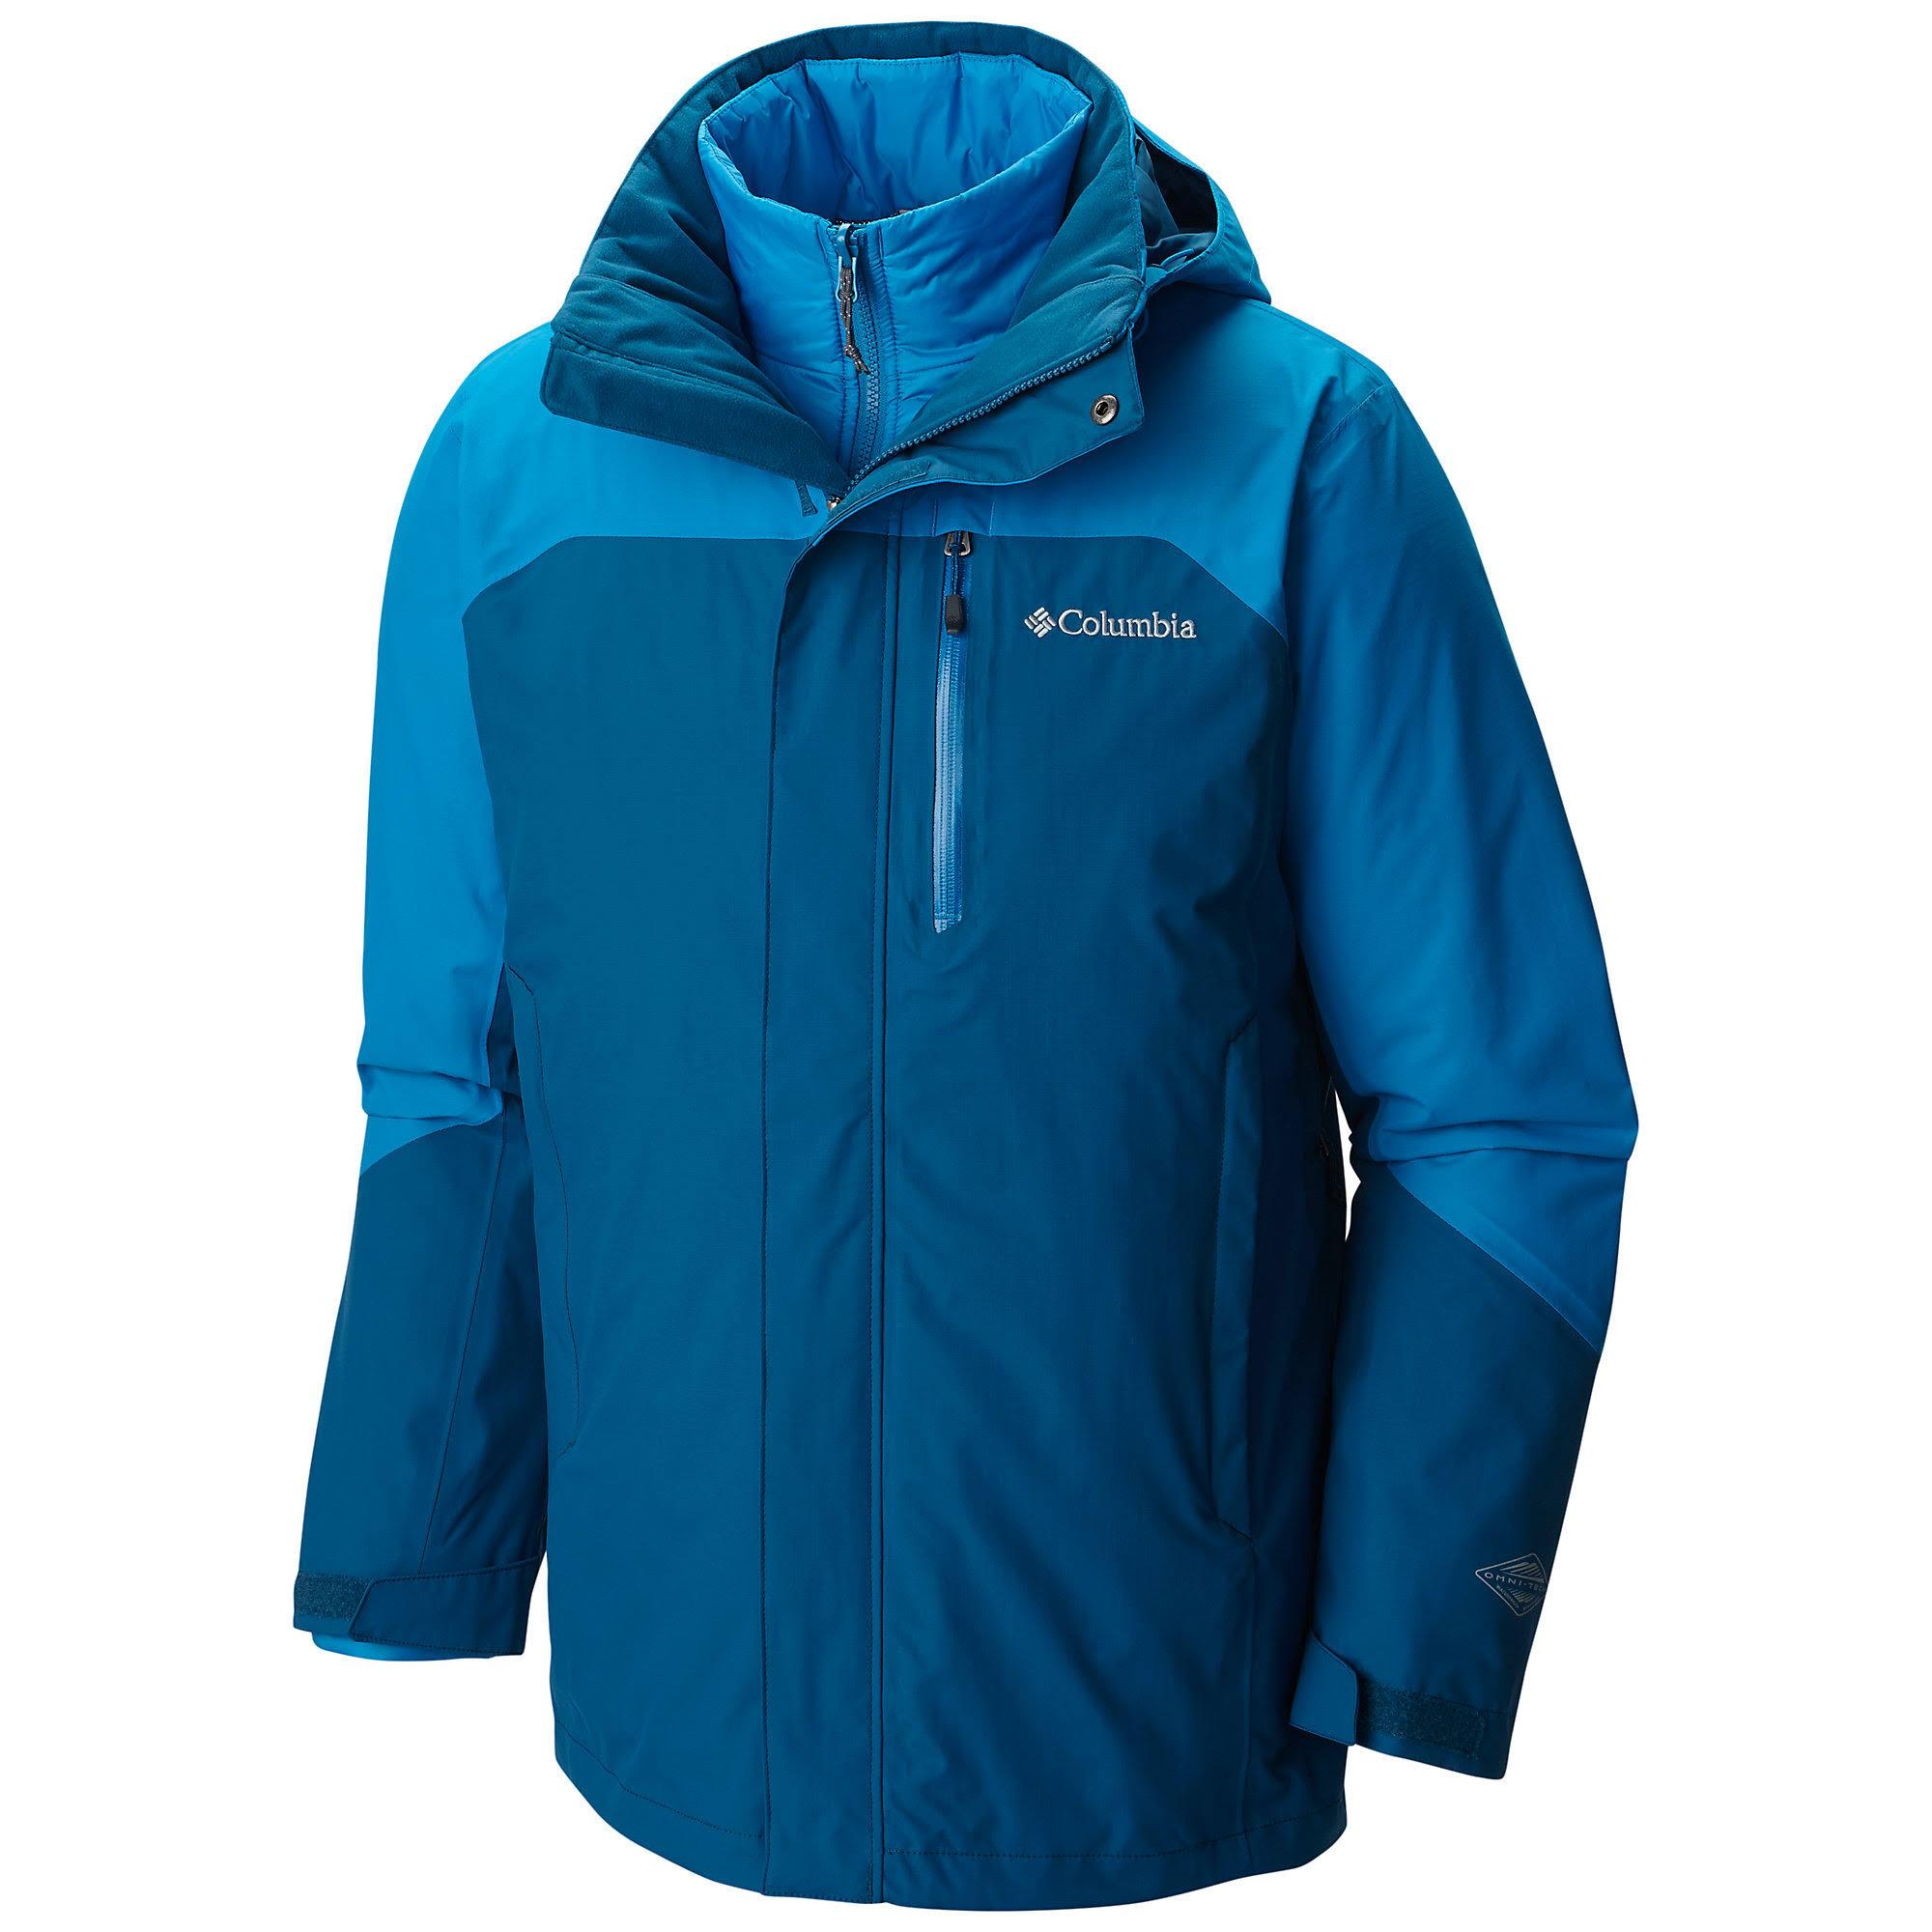 Größe Für Herren Small Blau Lhotse Ii Jacket Interchange Columbia qIFwxYva7n